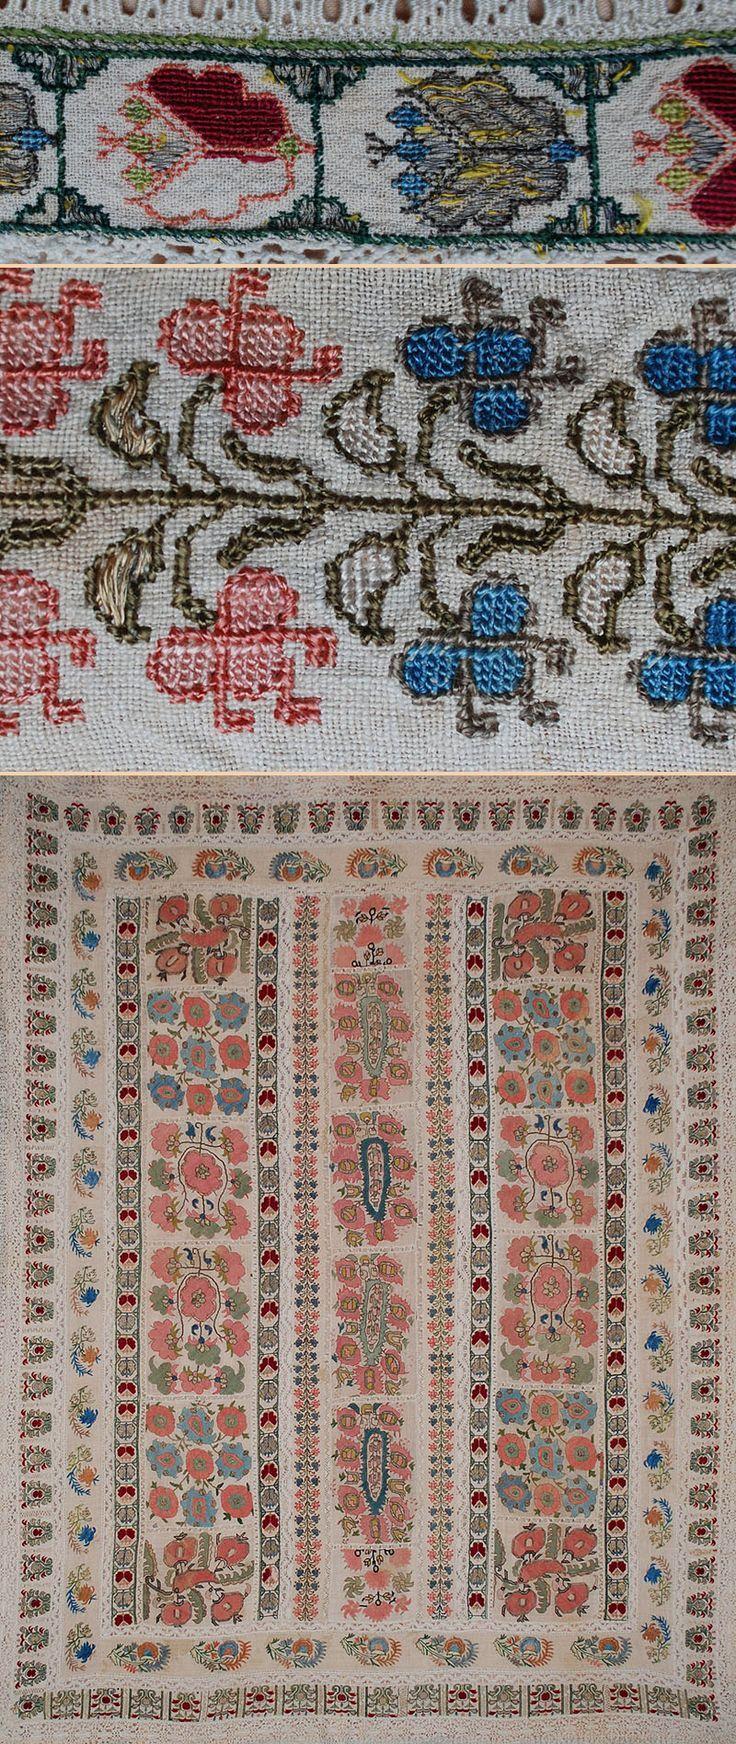 ottoman embroidery | Antique Textiles Ottoman Embroidery